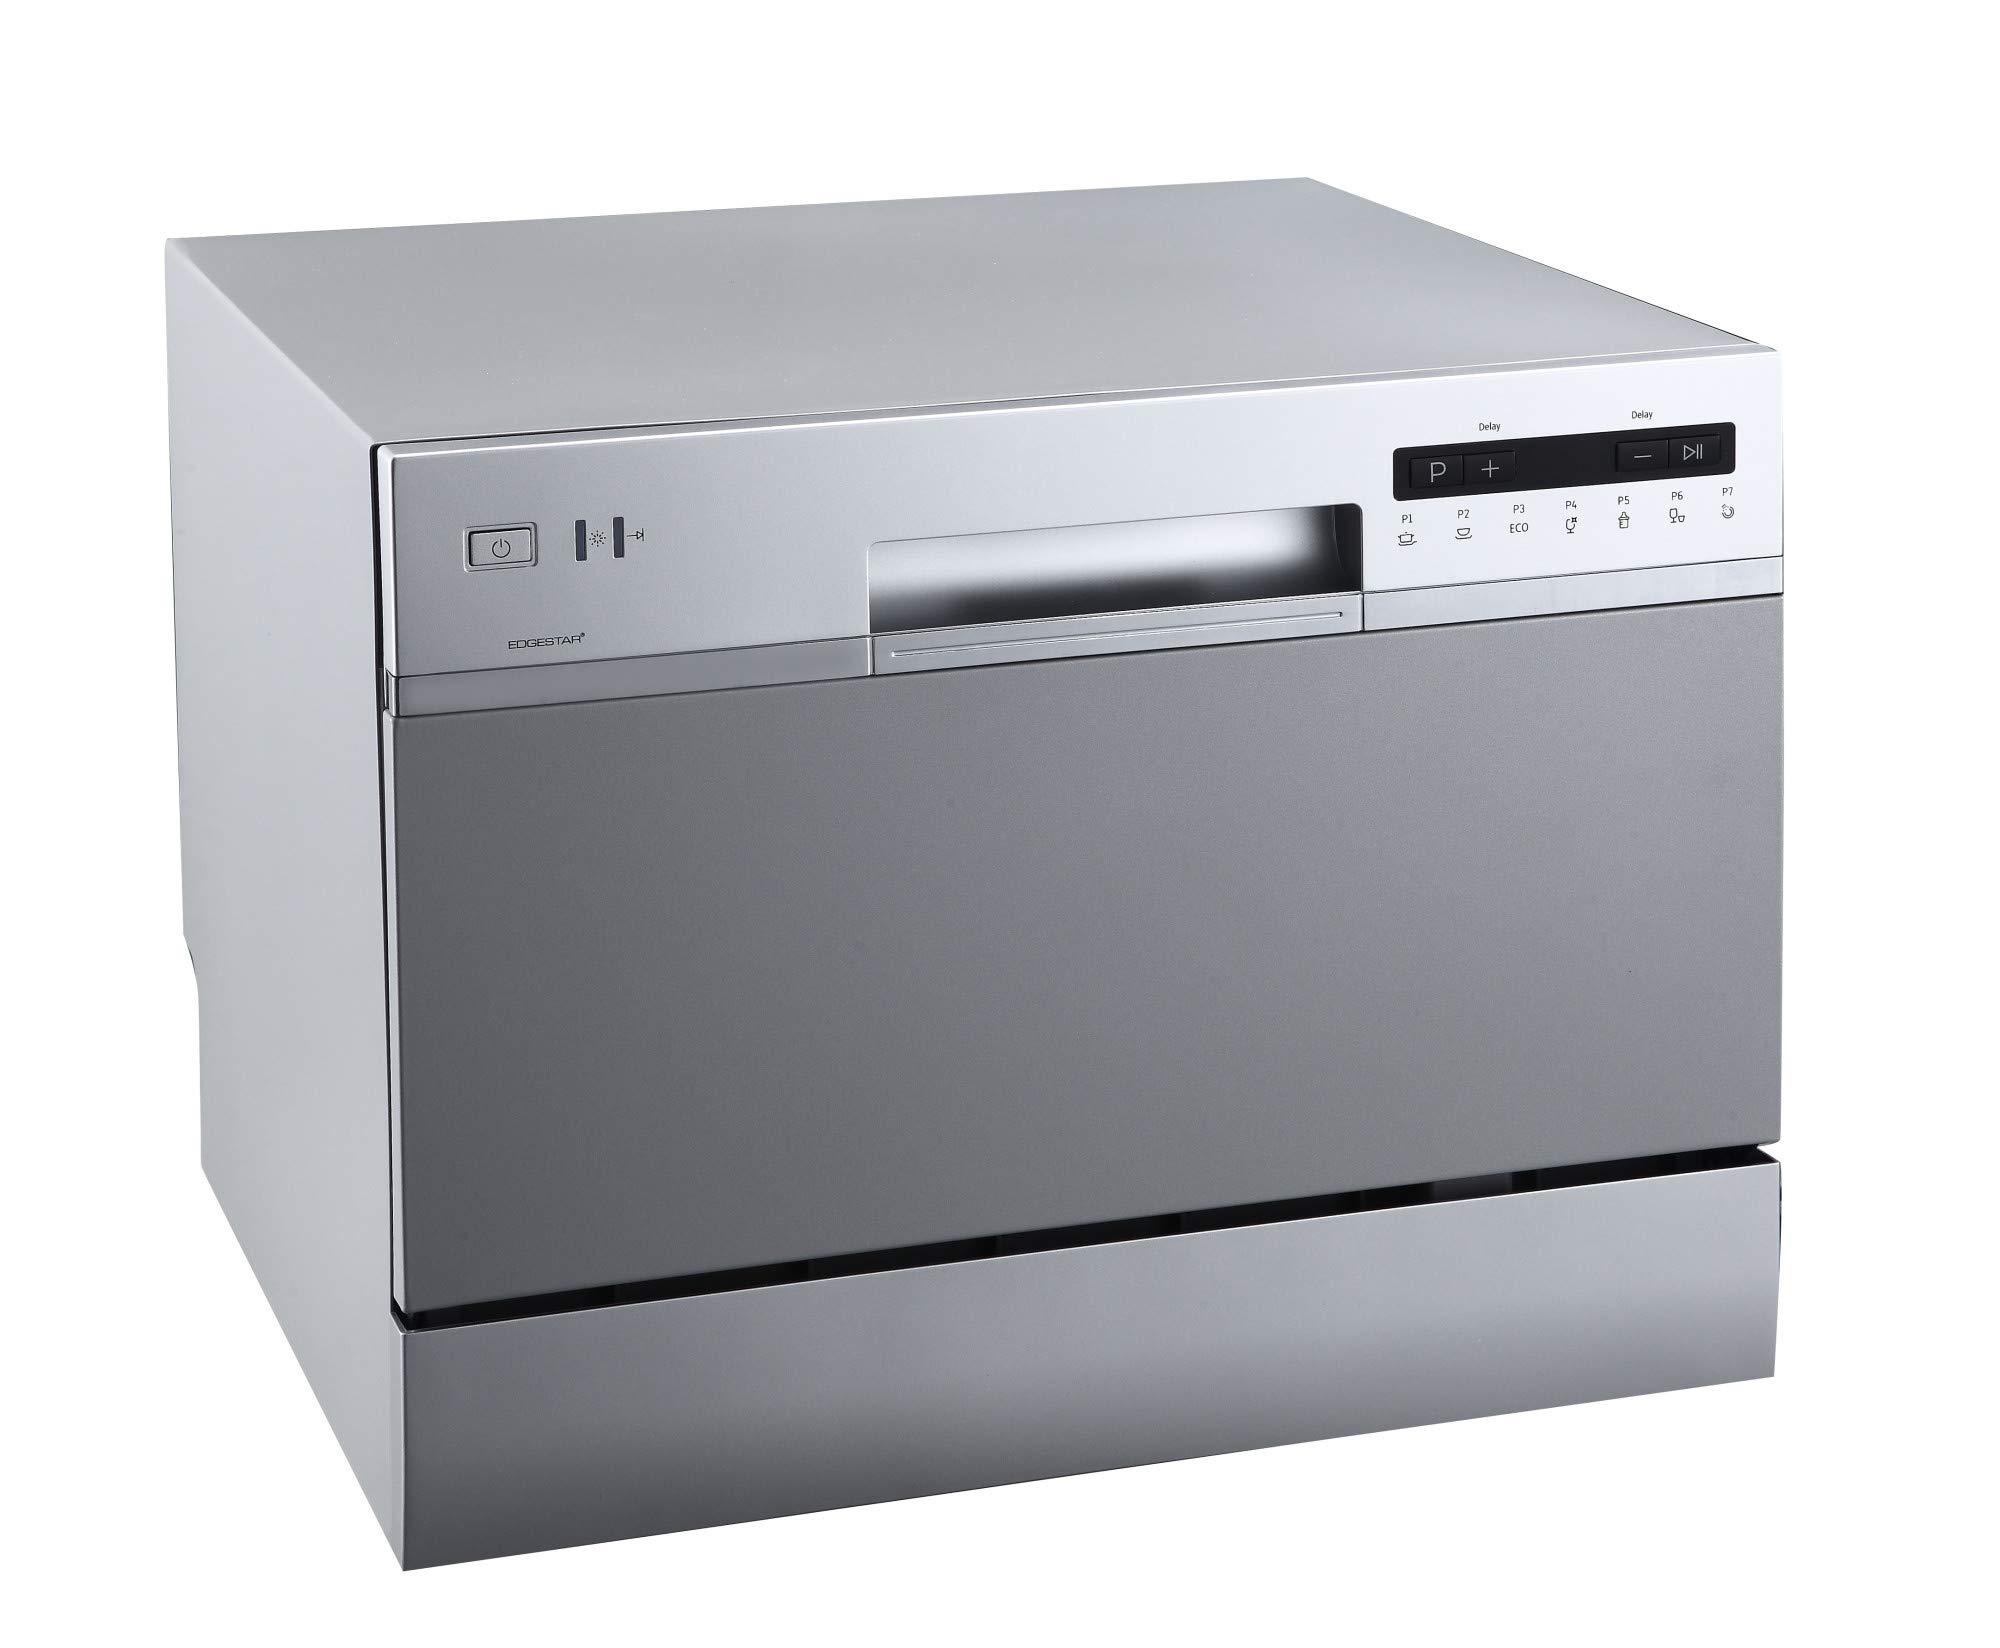 EdgeStar DWP62SV 6 Place Setting Energy Star Rated Portable Countertop Dishwasher - Silver by EdgeStar